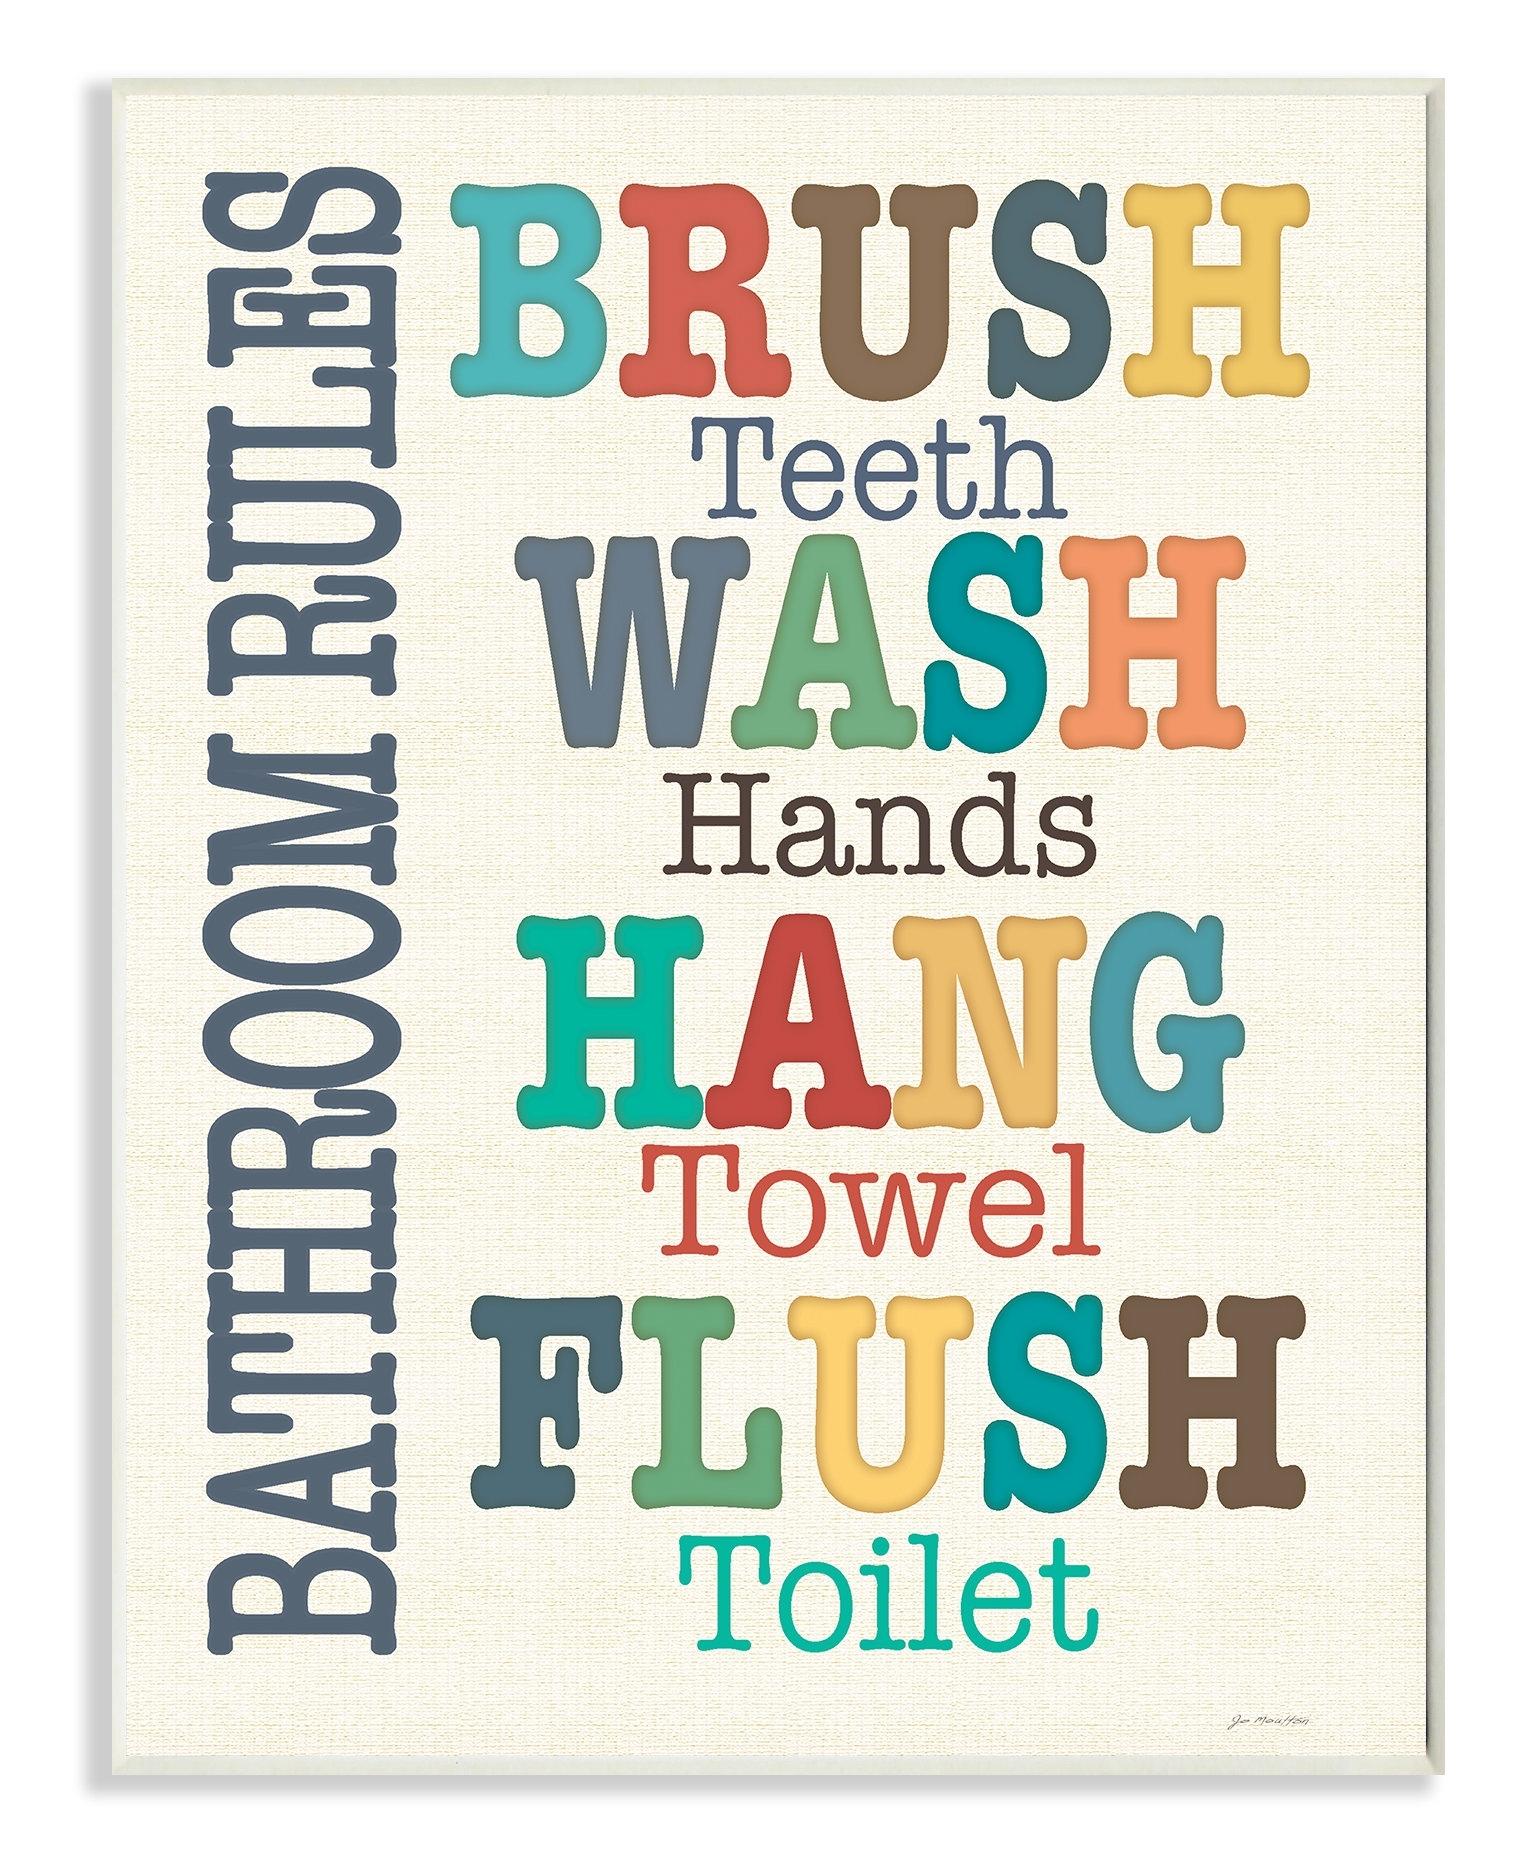 Harriet Bee Wall Plaque 'colorful Bathroom Rules' Textual Art Throughout 2018 Bathroom Rules Wall Art (Gallery 5 of 20)